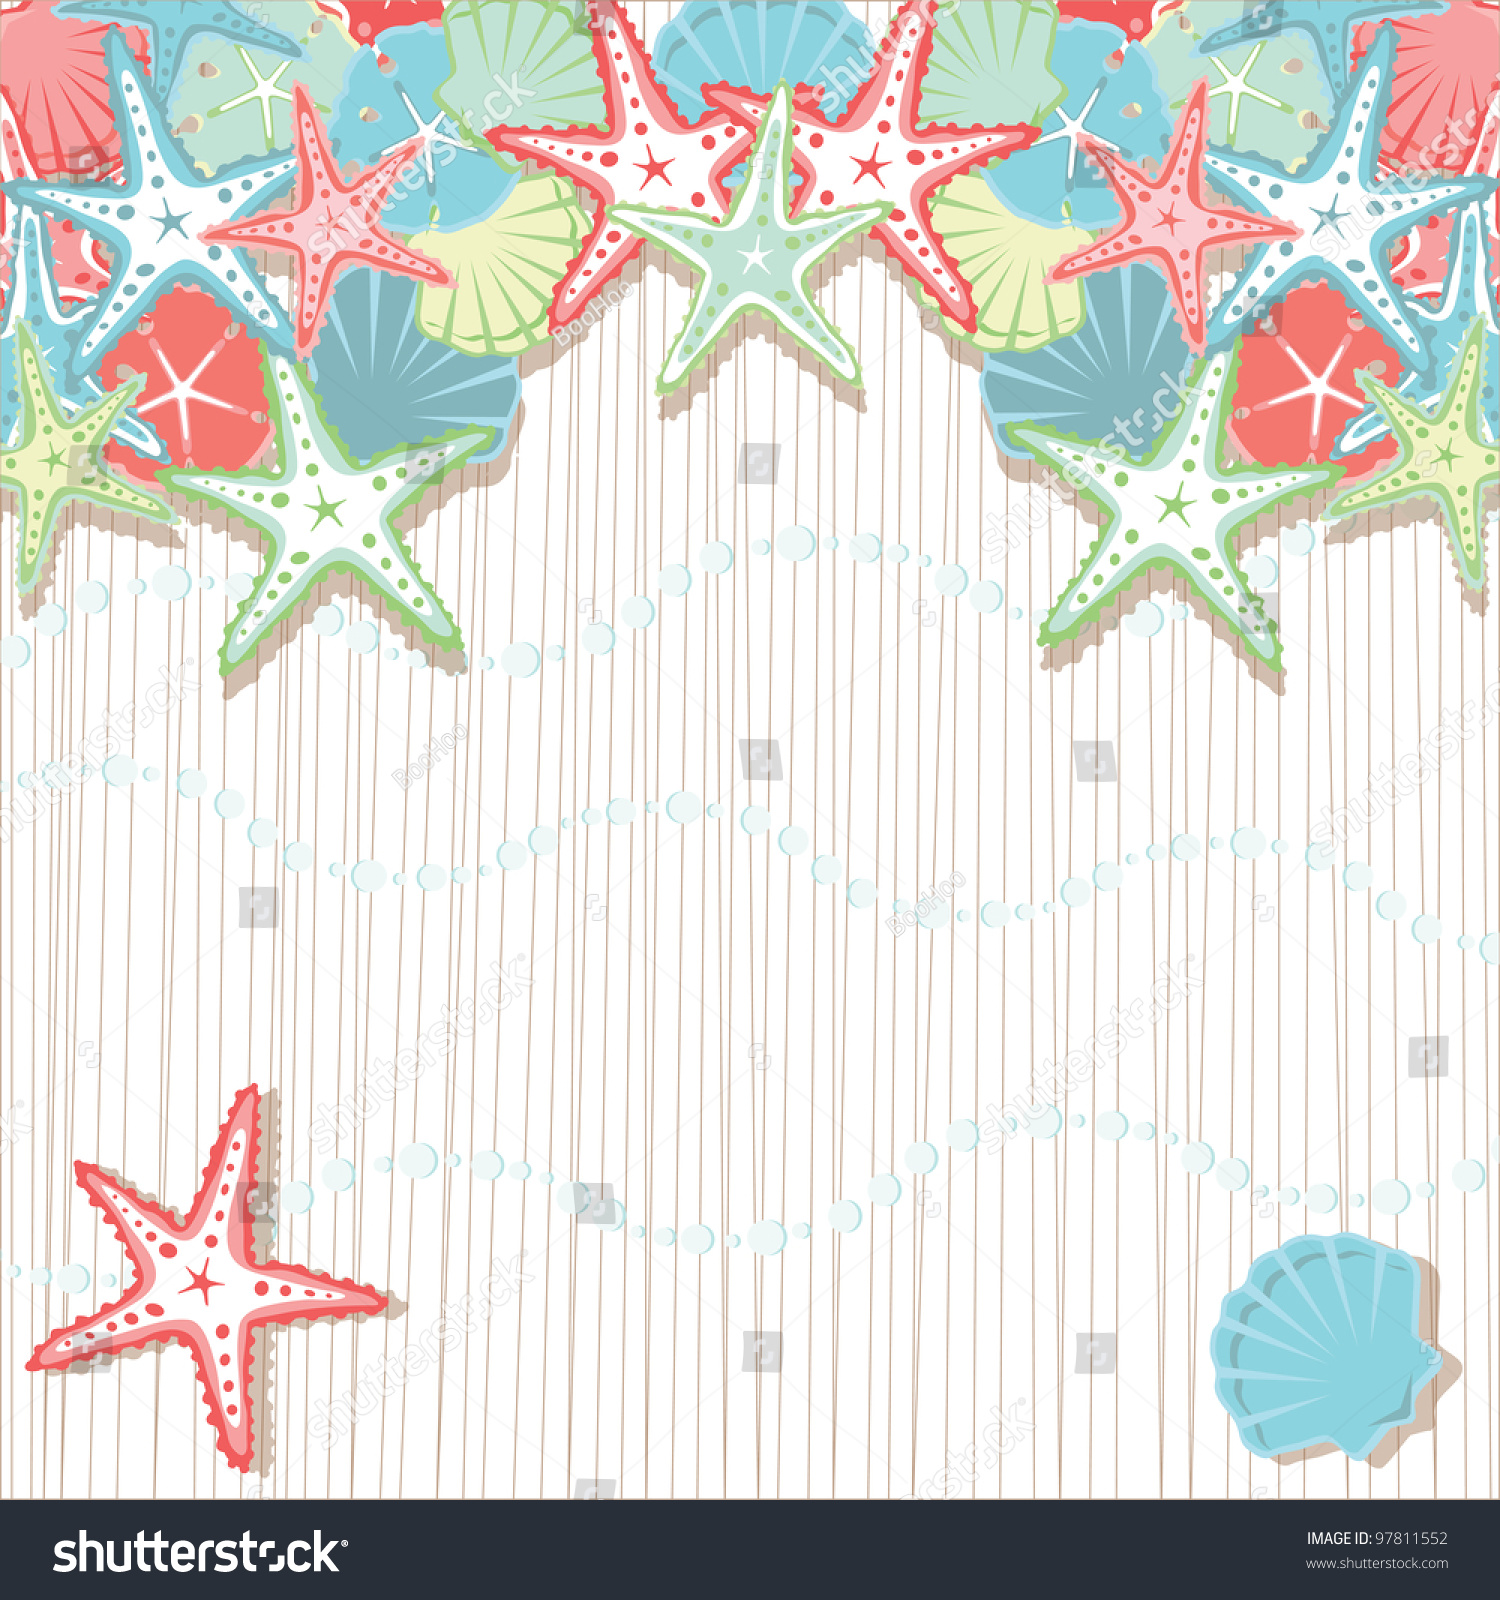 Seashell Beach Party Invitations Soft Colored Stock Vector 97811552 ...